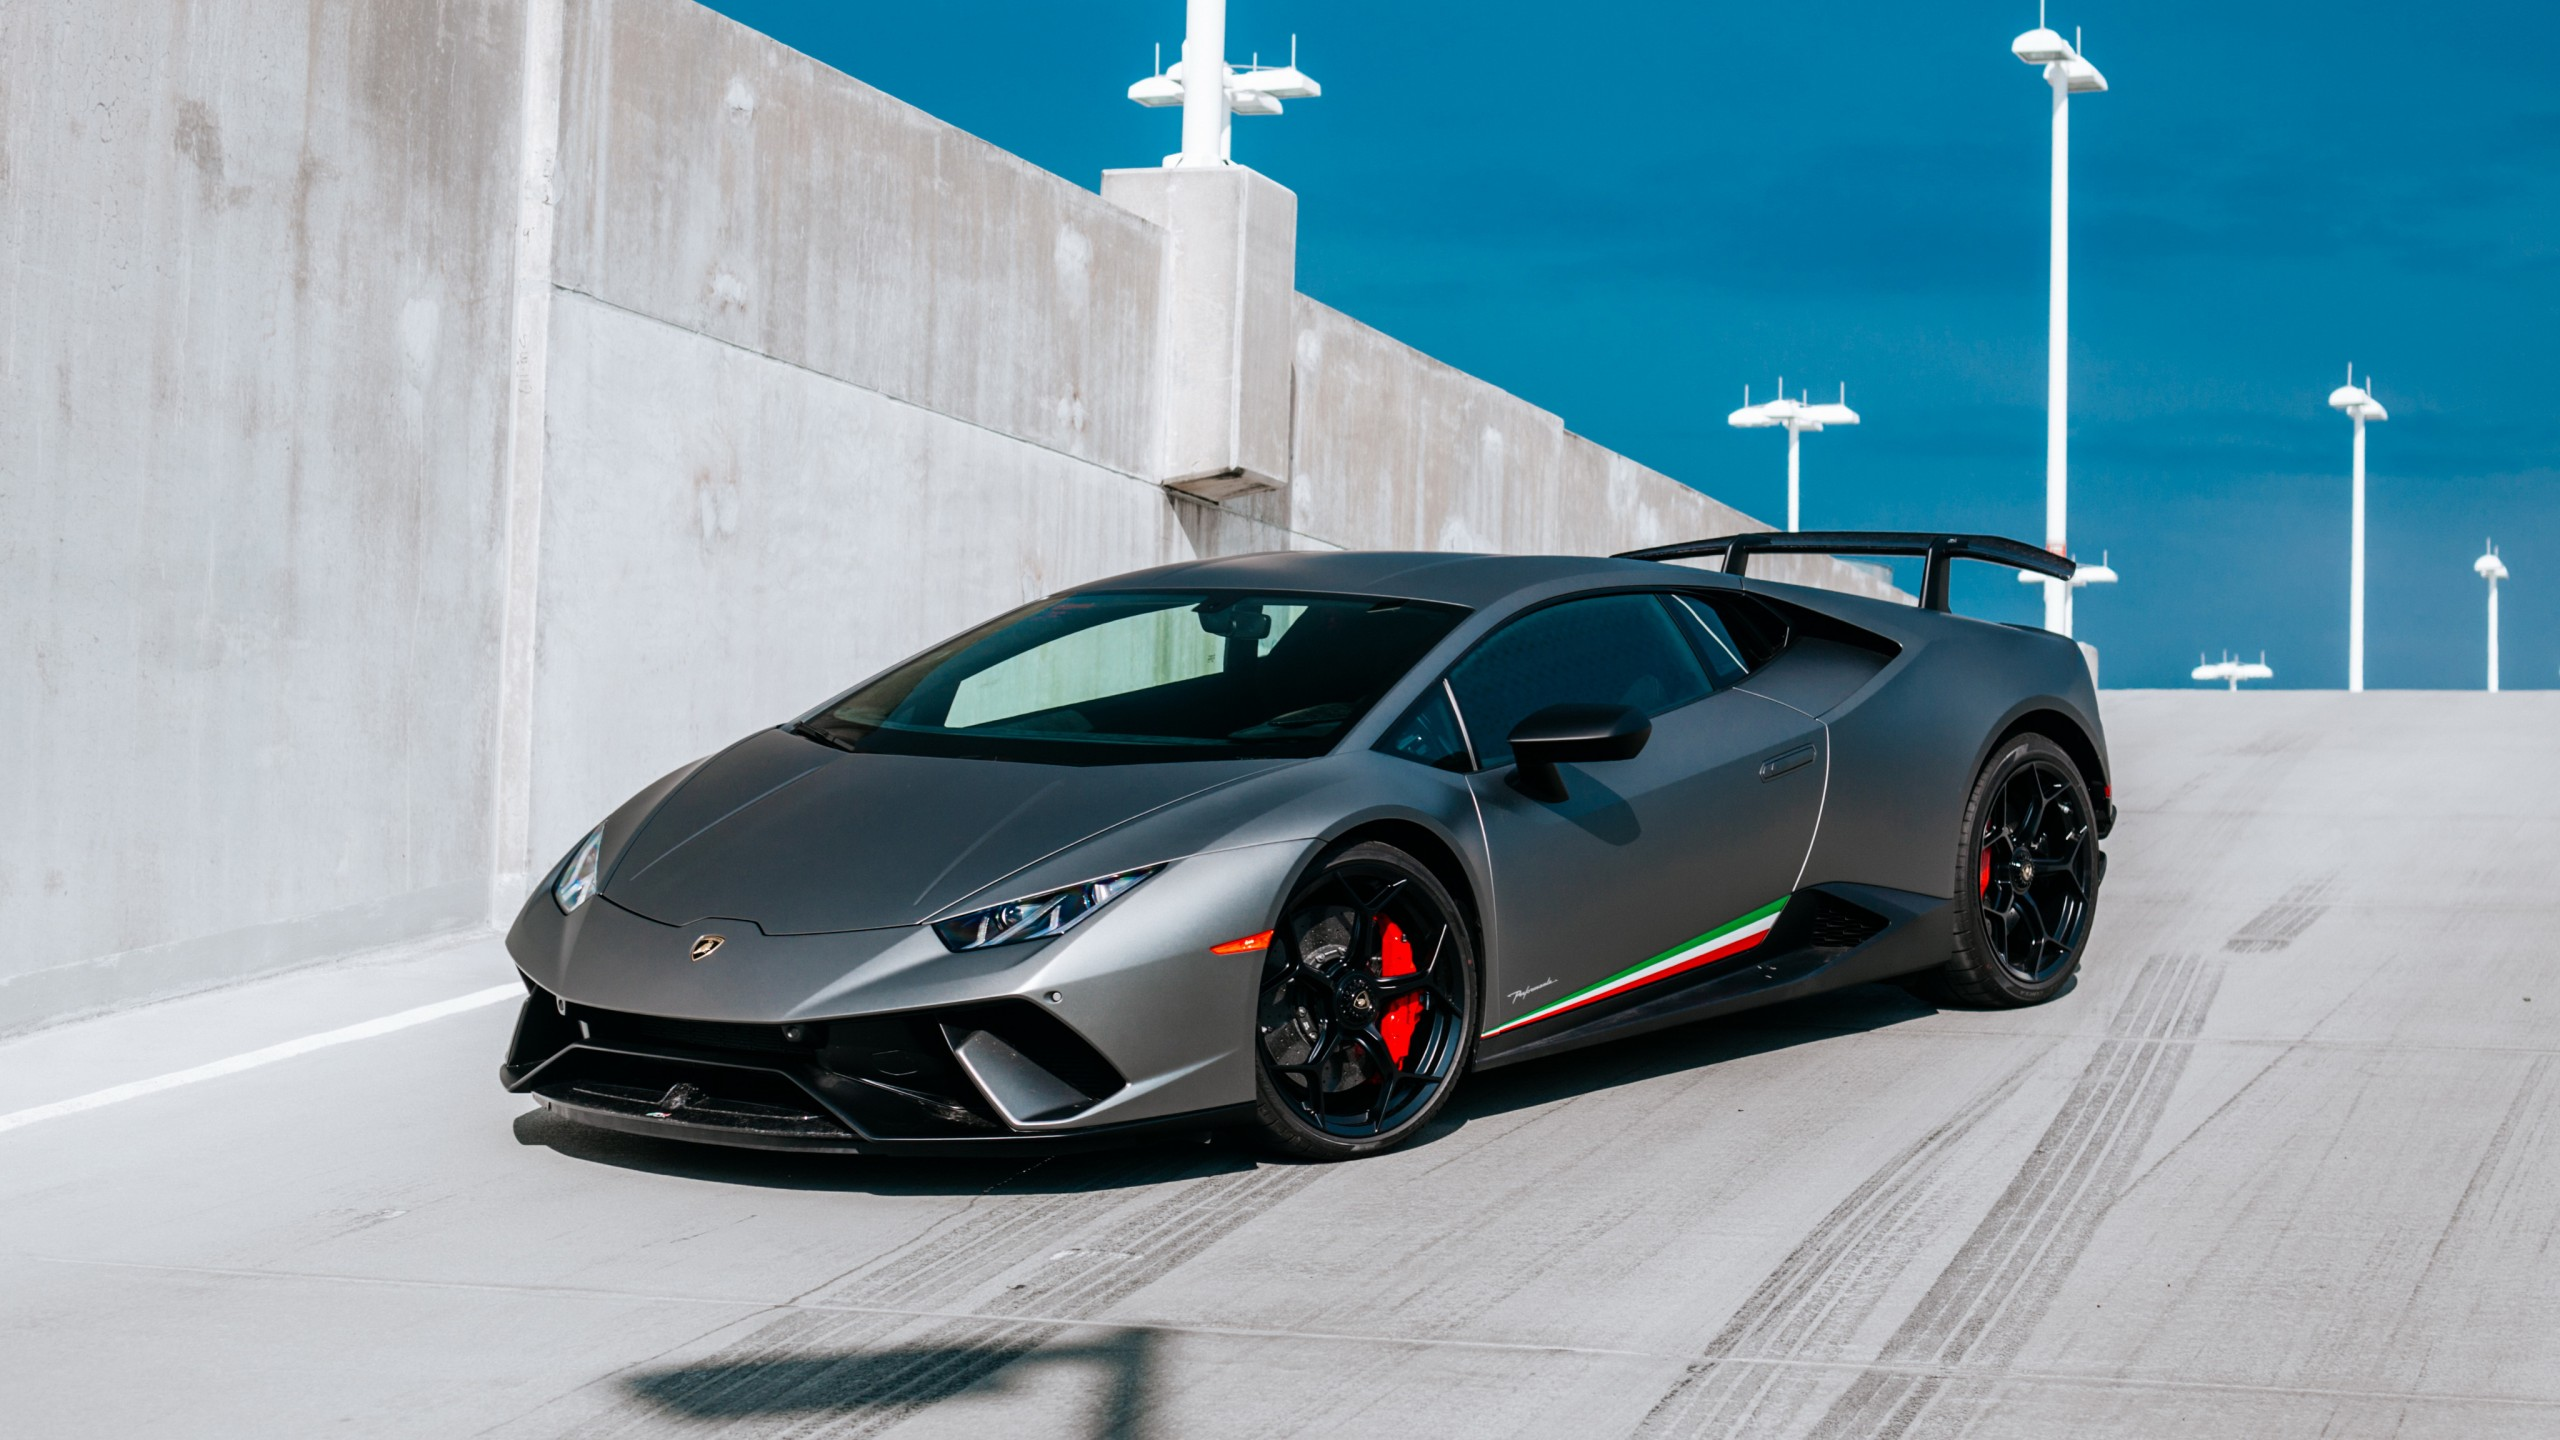 2017 Lamborghini Huracan Performante 4K 2 Wallpaper HD